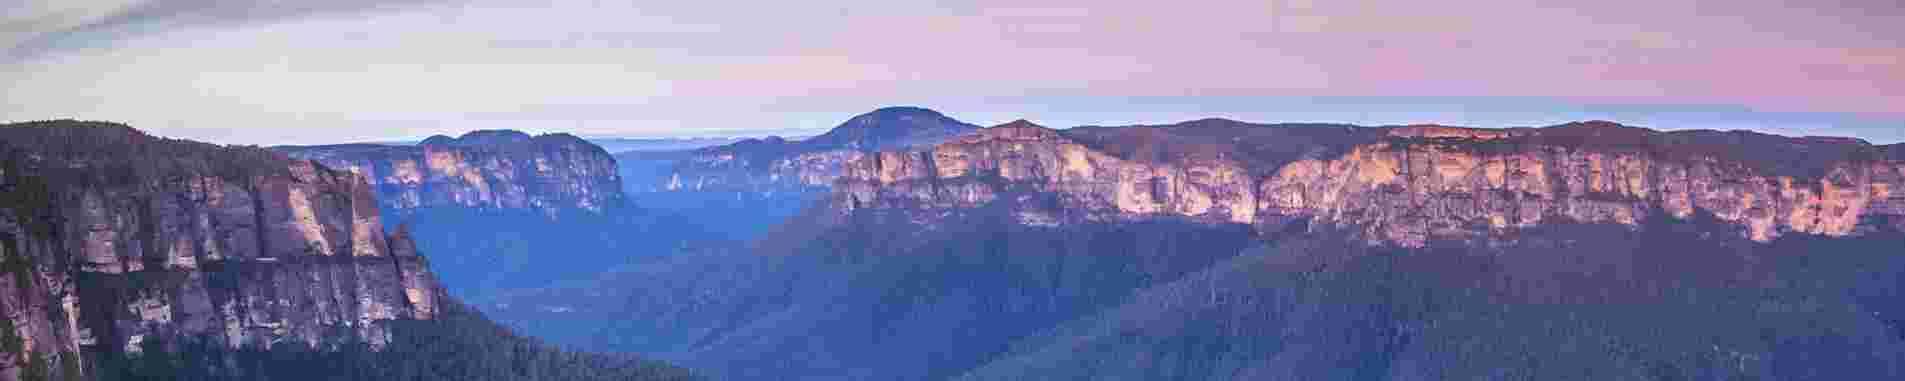 Blue Mountains header image